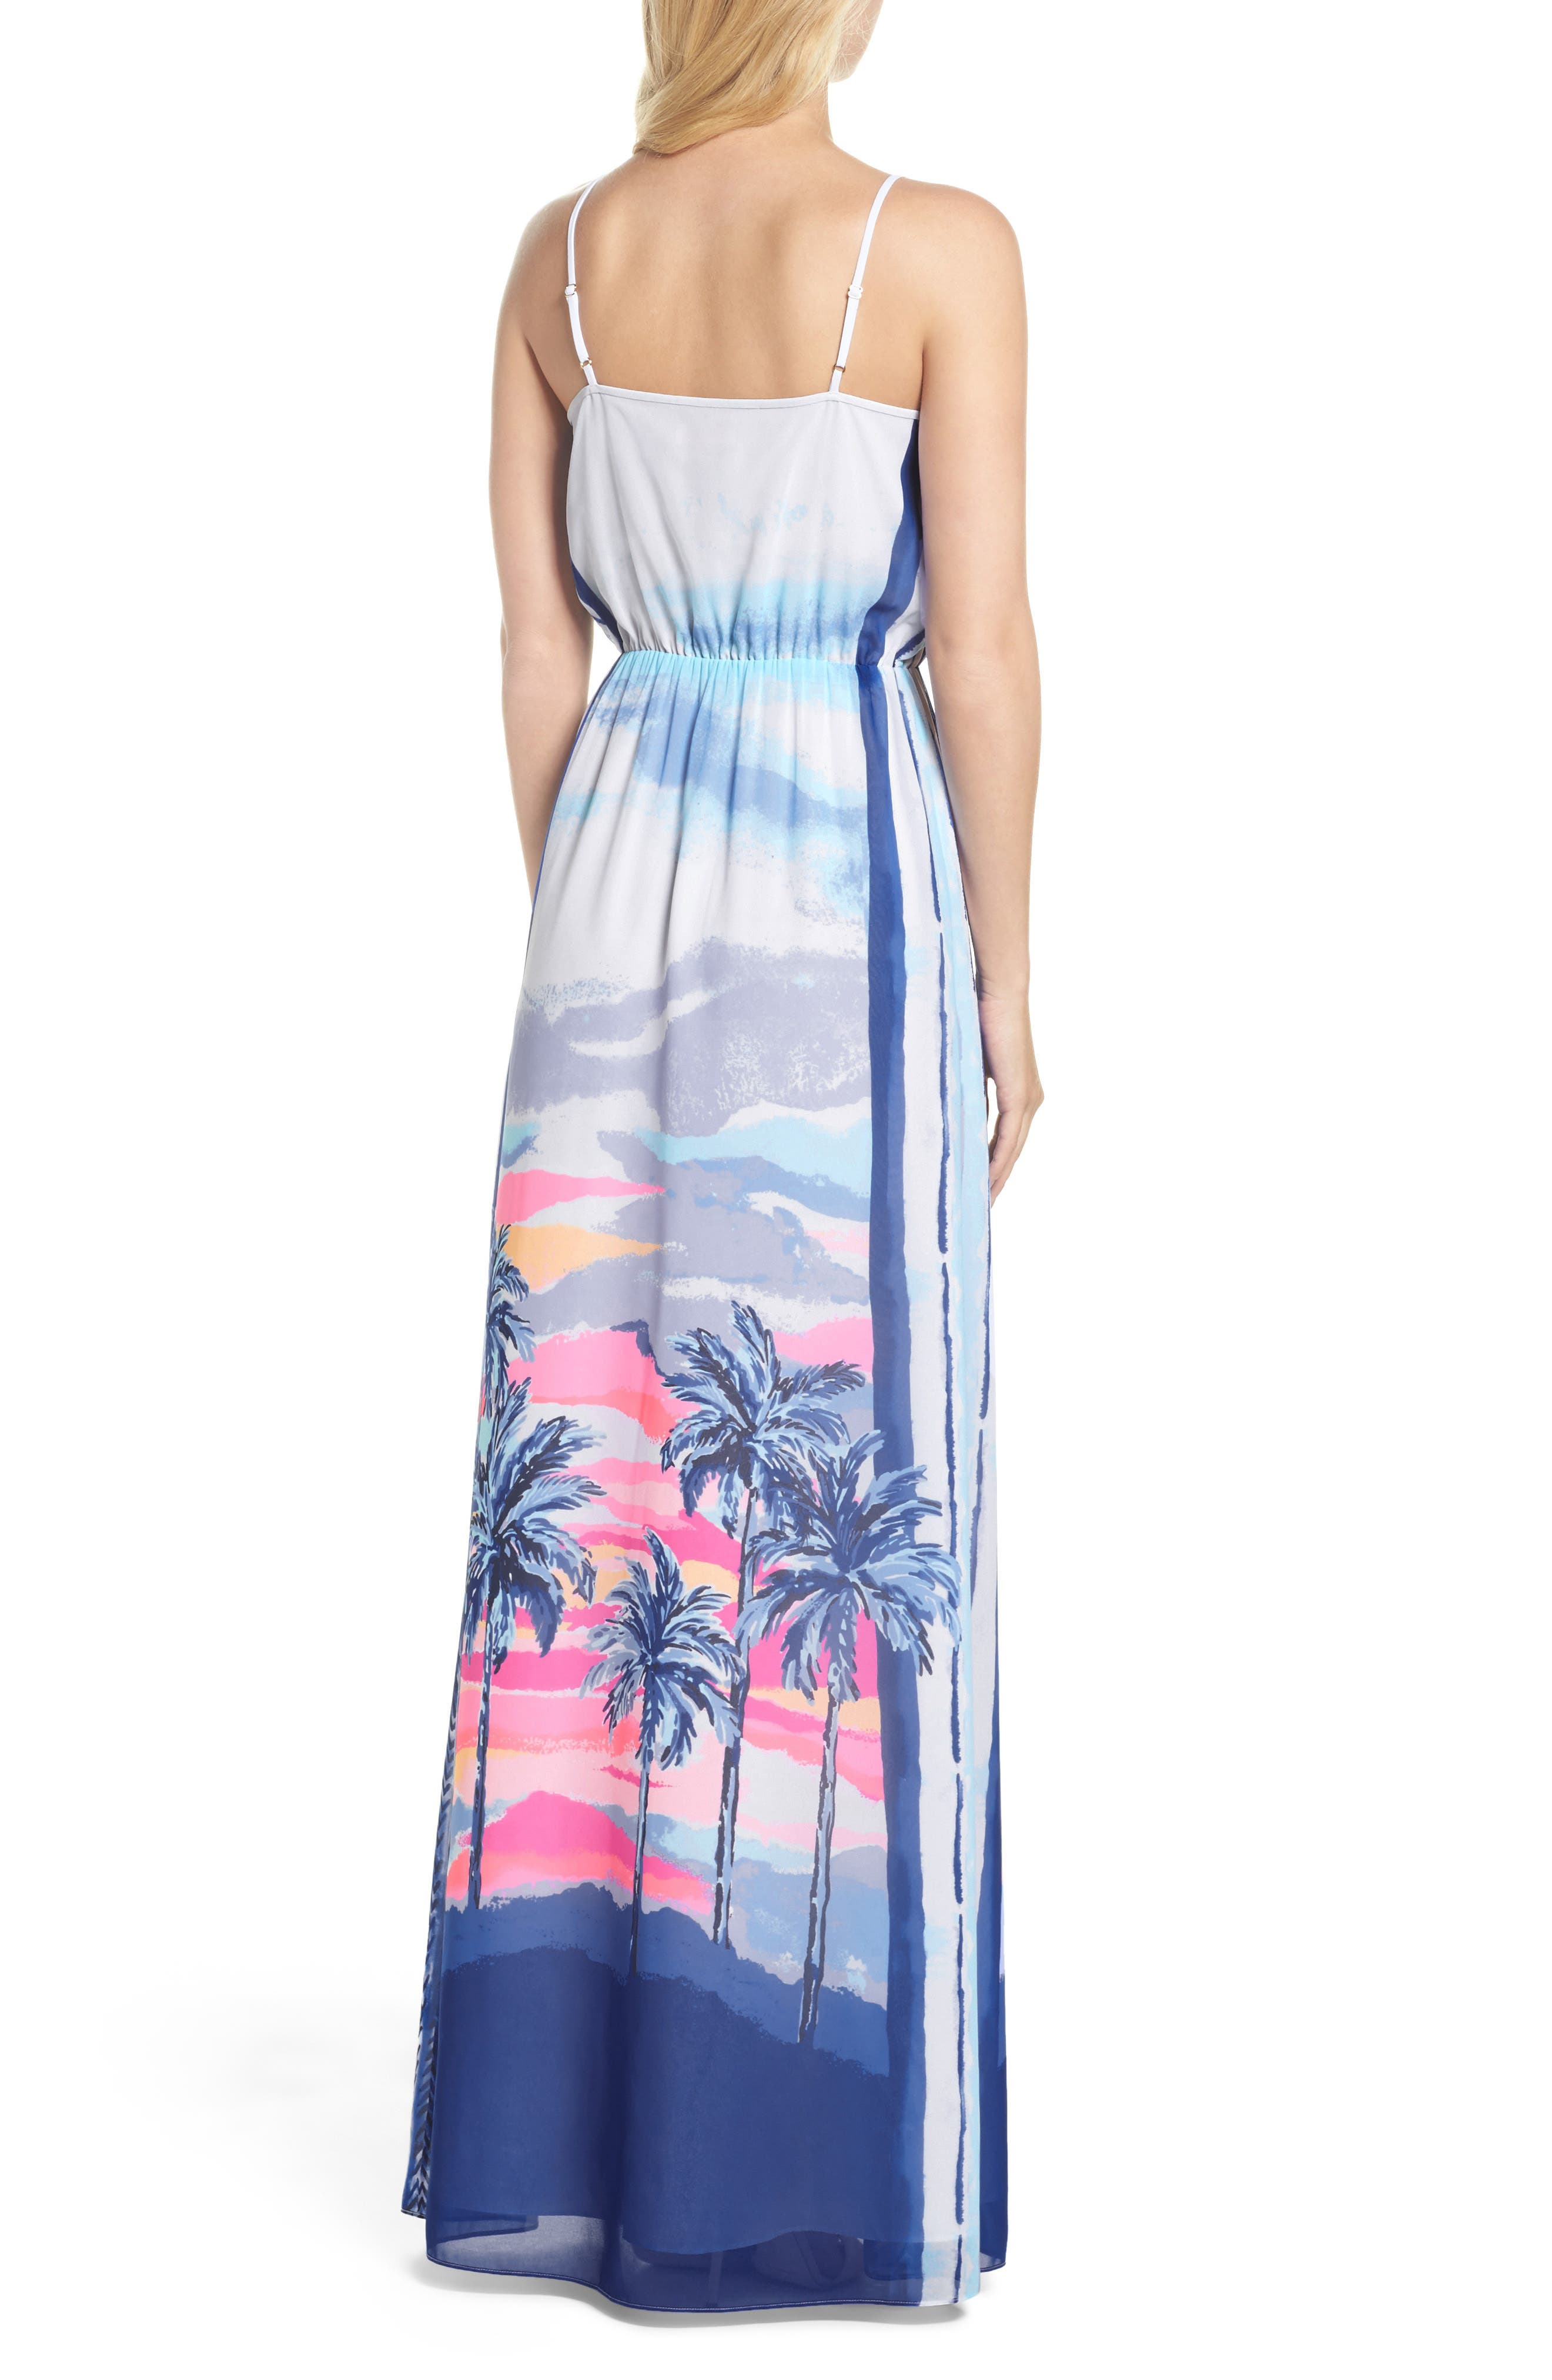 Deanna Maxi Dress,                             Alternate thumbnail 2, color,                             697